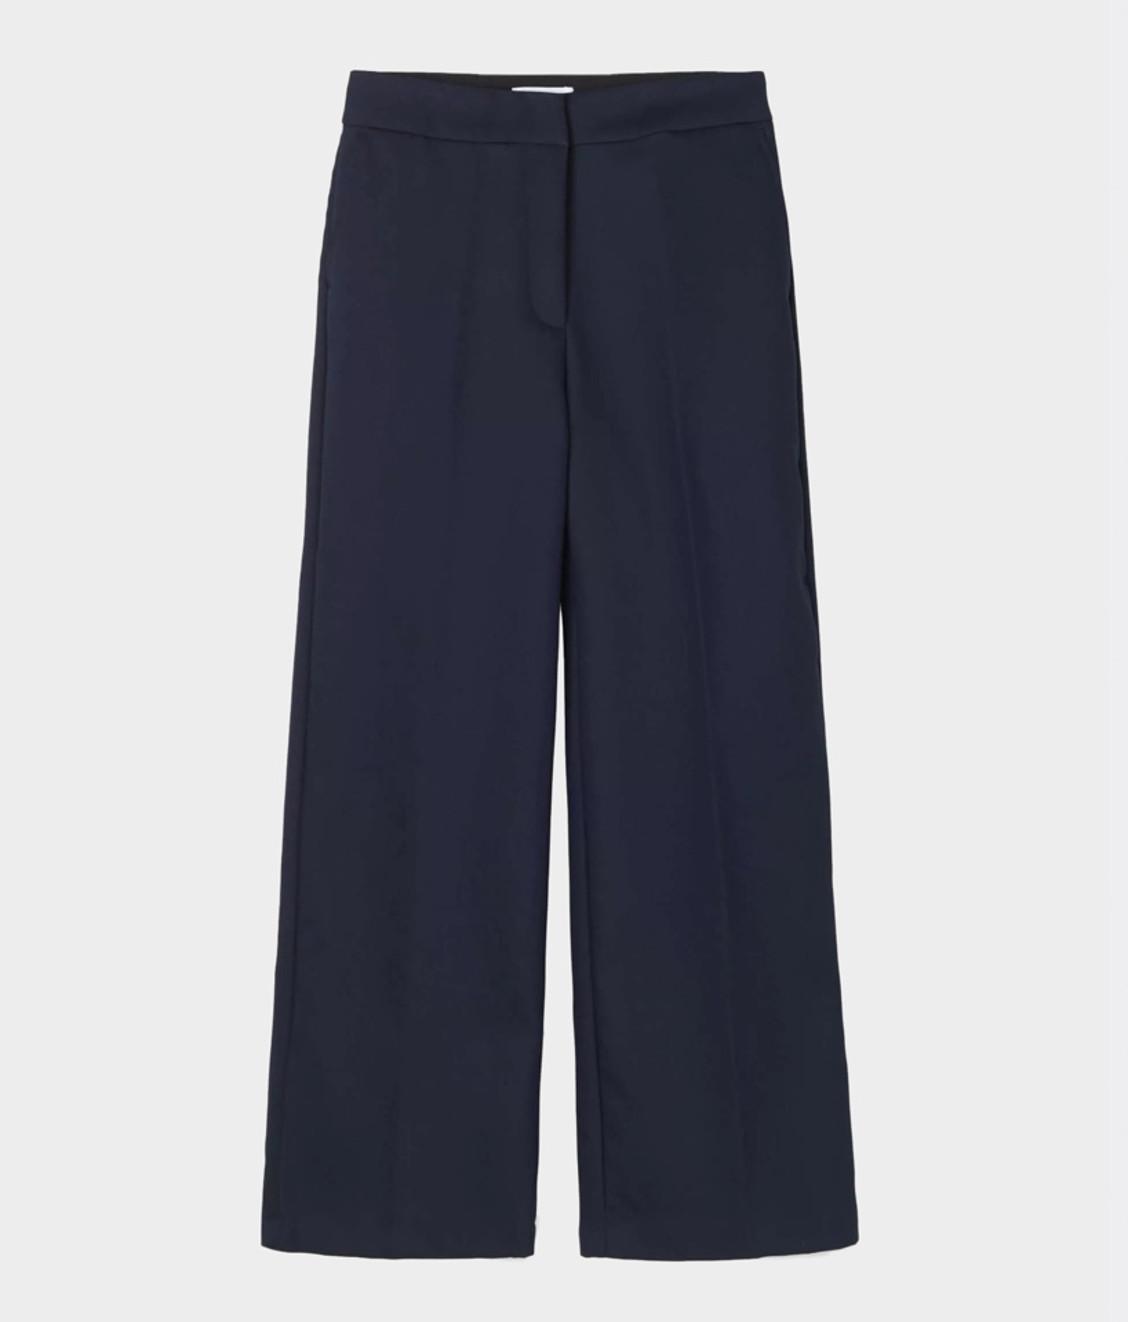 Libertine Libertine Libertine Lark Trousers Navy